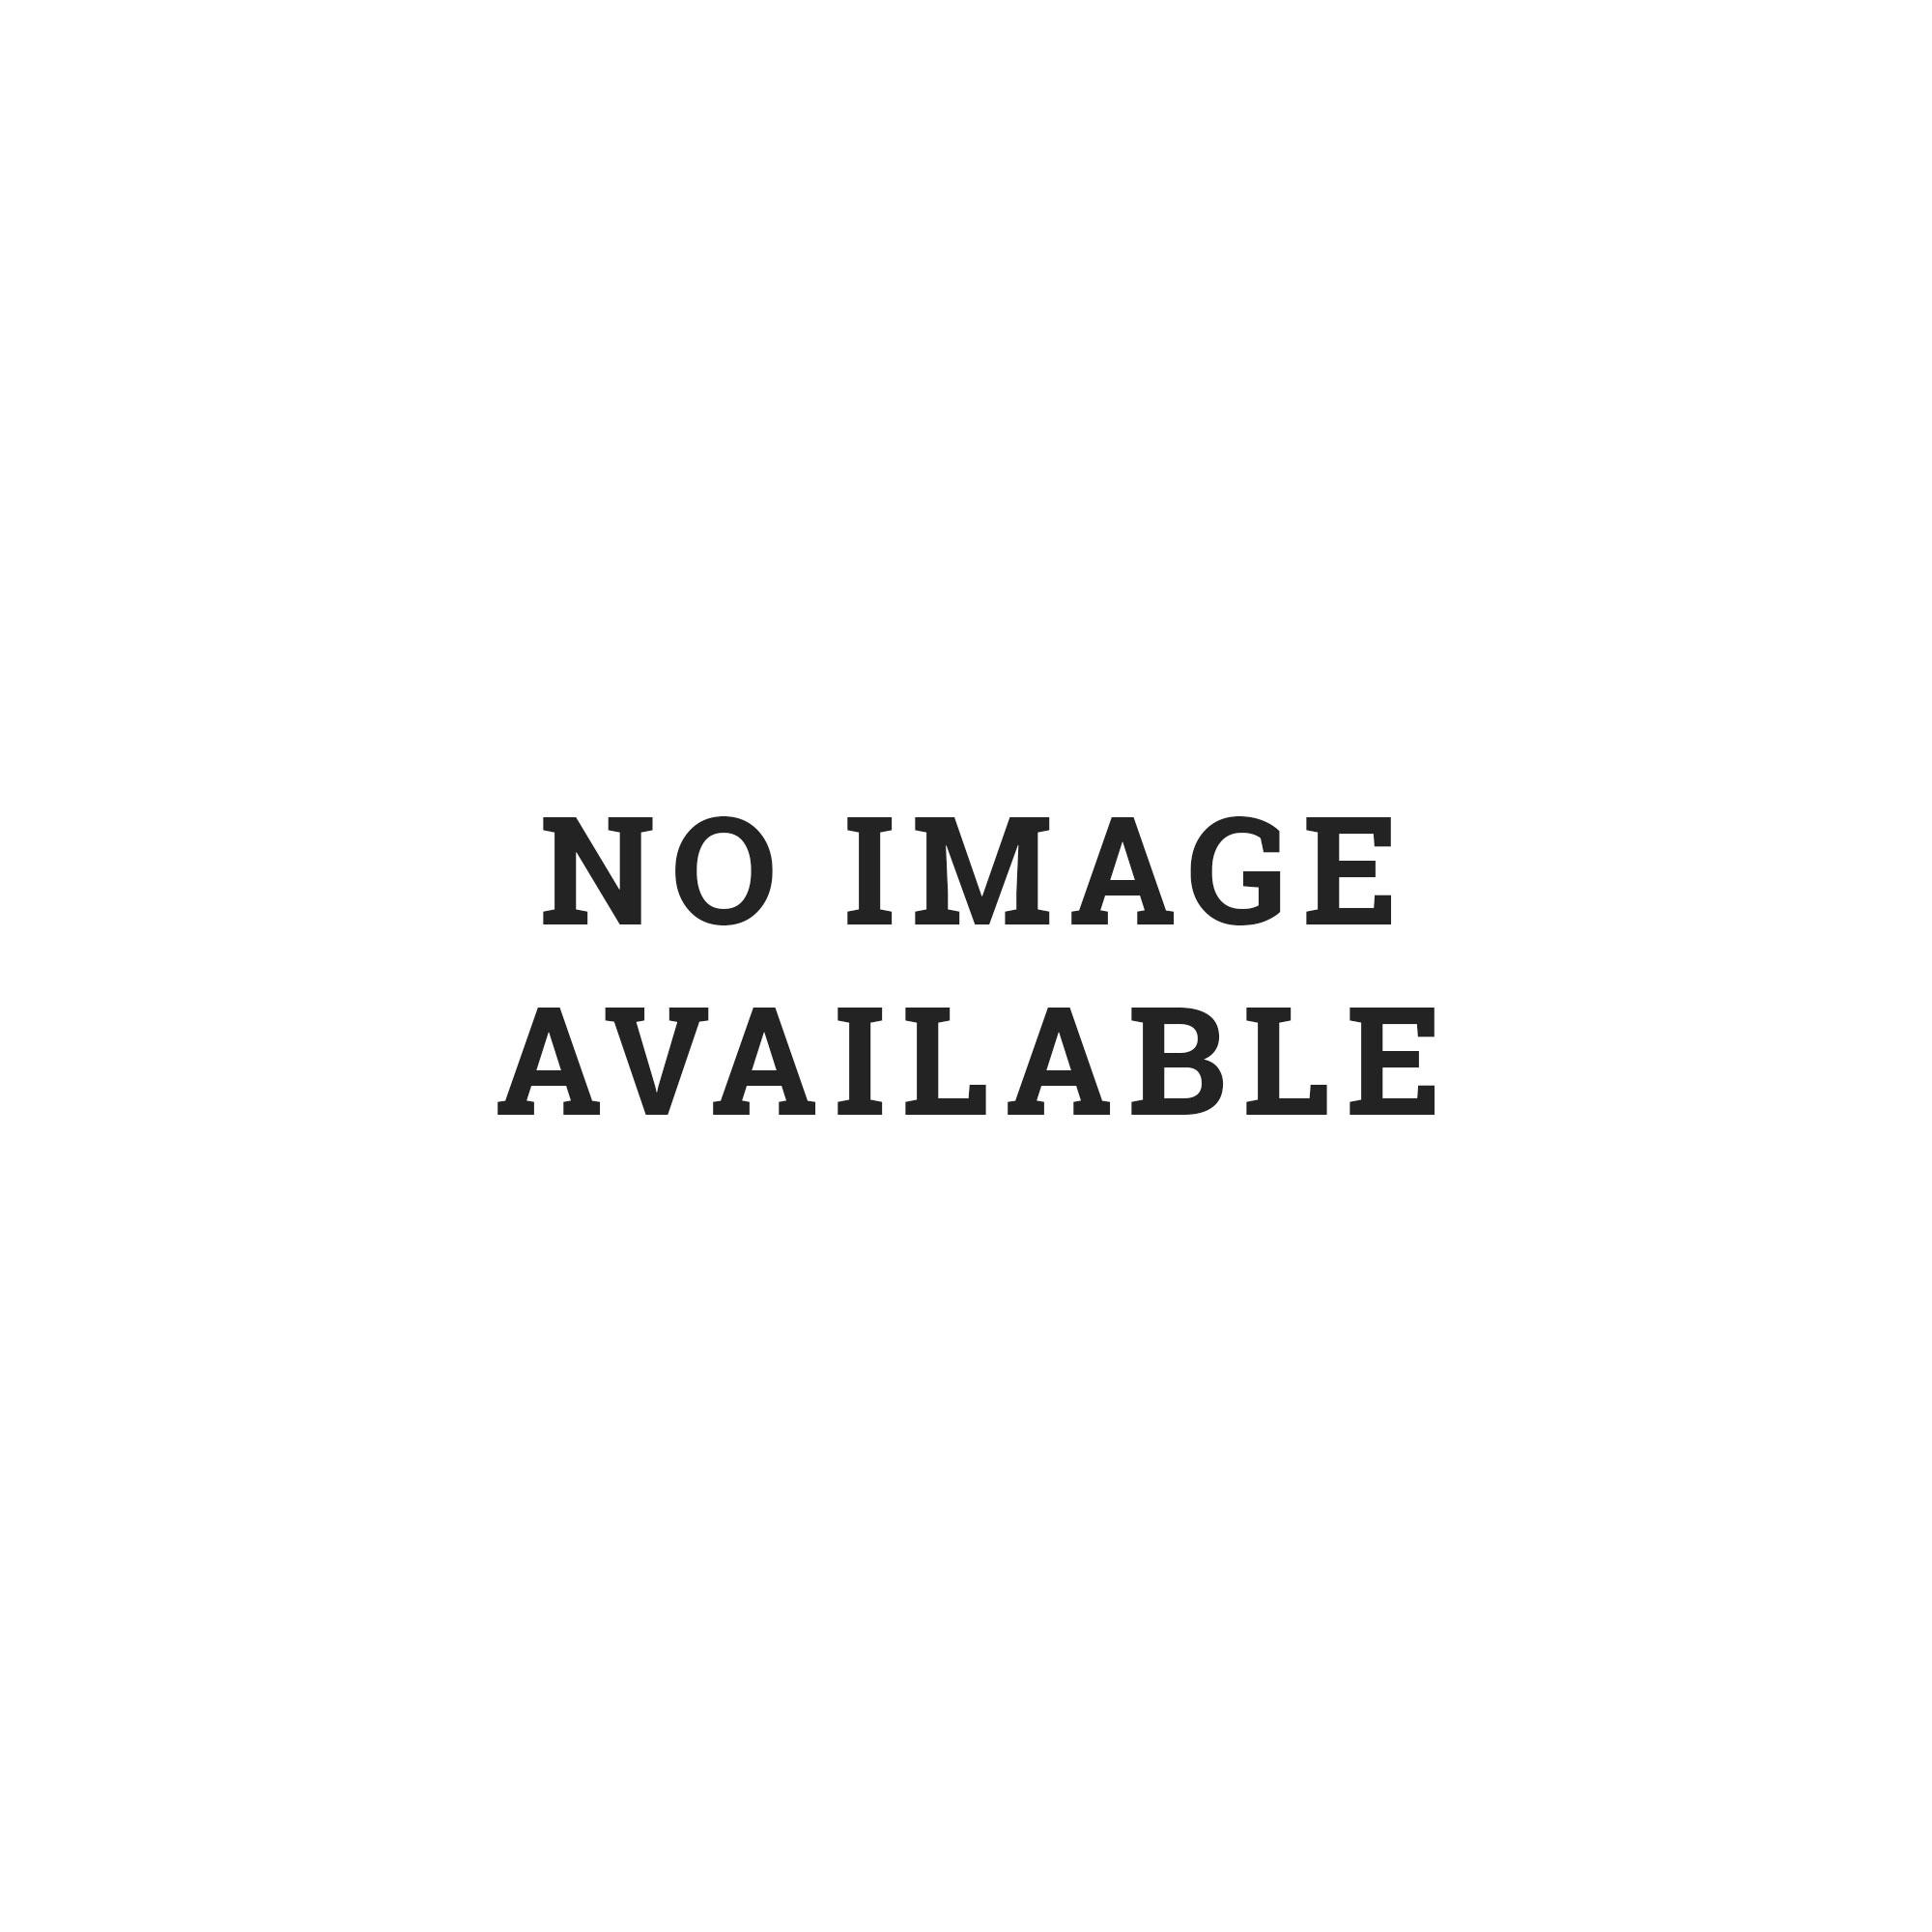 Dr Martens Castel Belladonna Flowers Womens Canvas 8-Eyelet Ankle Boots - Black Floral